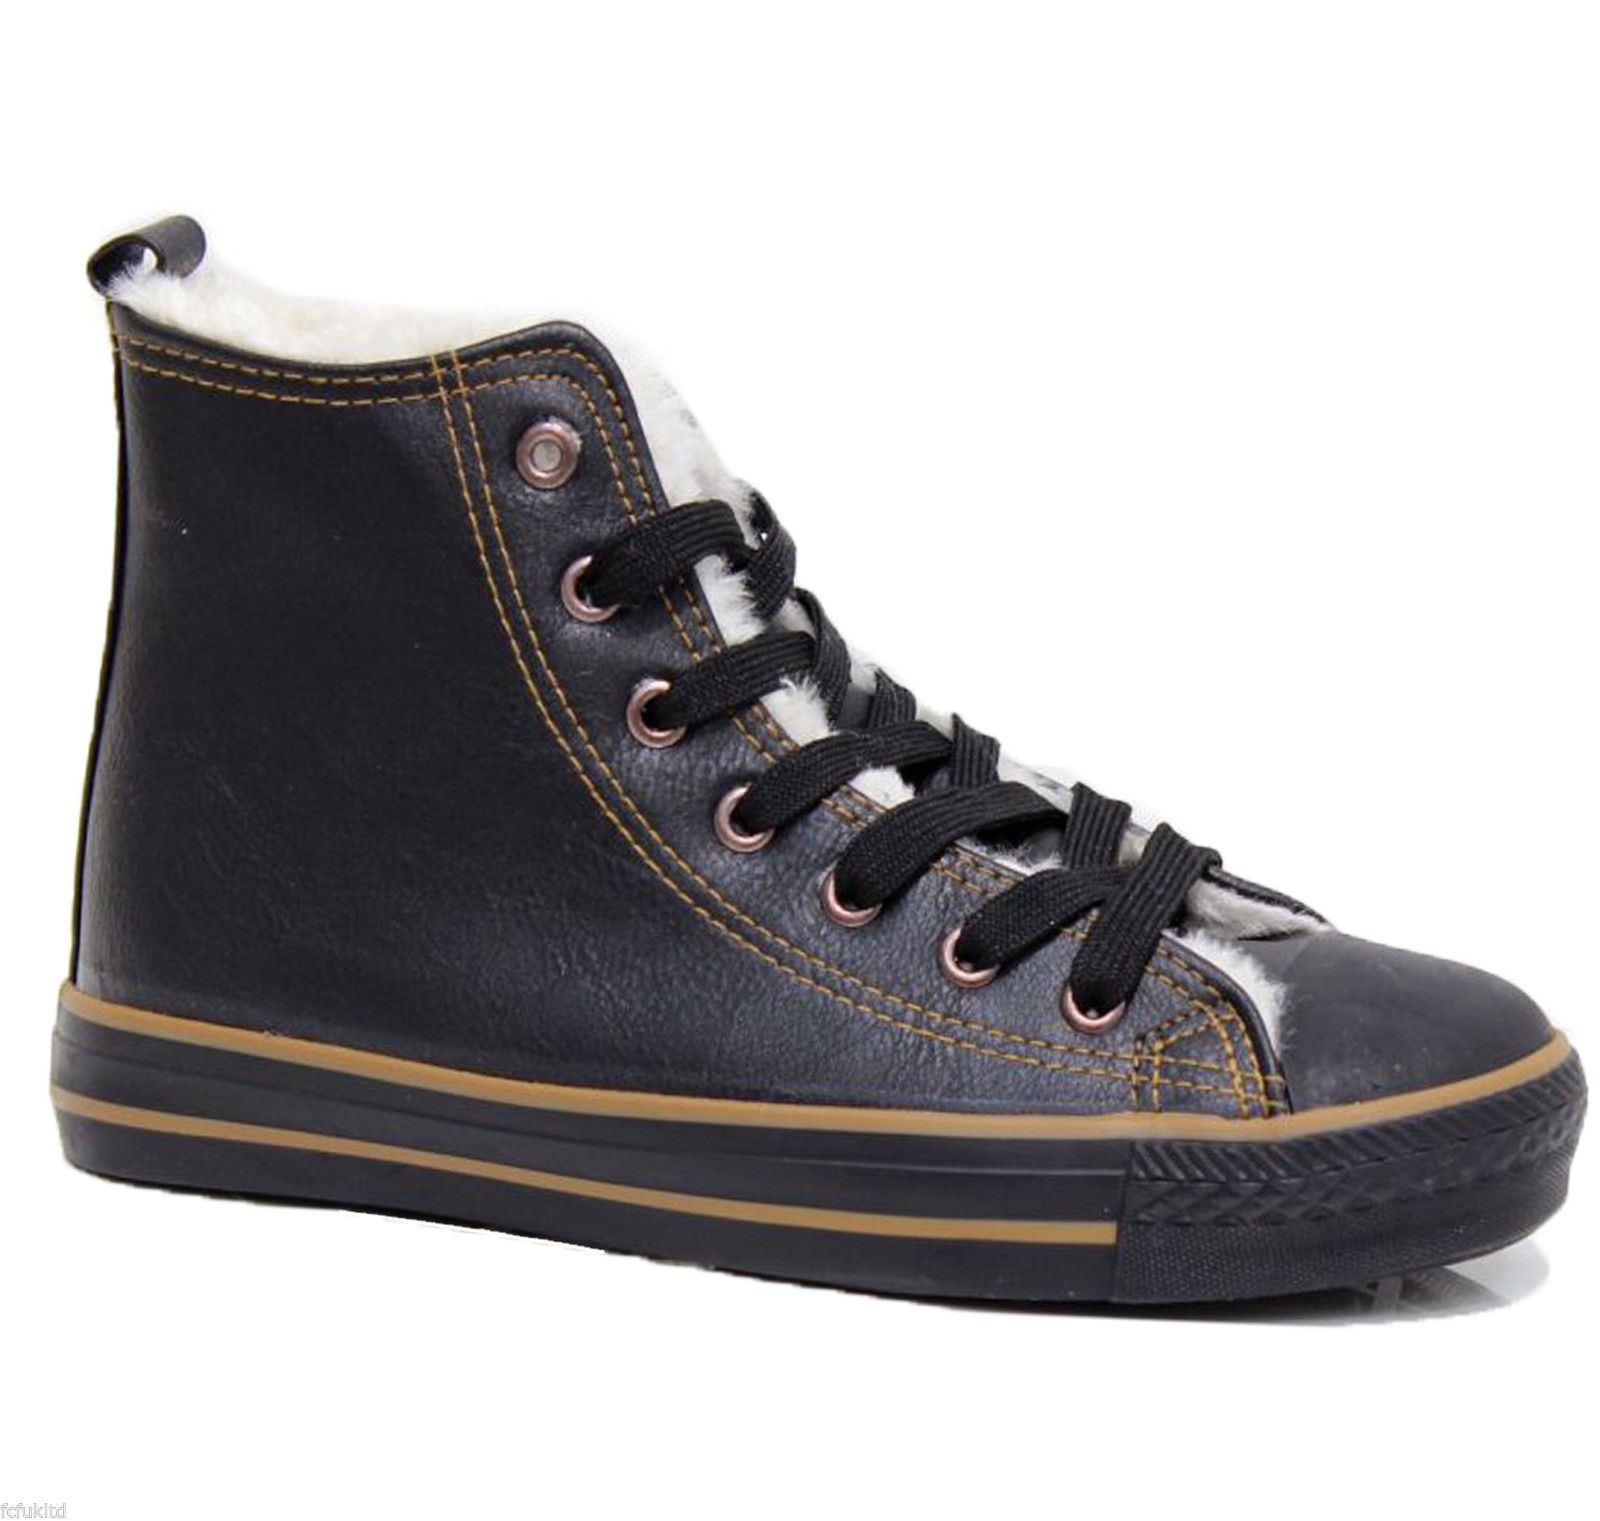 Women's WX608v4 Comfort Pack Training Shoe